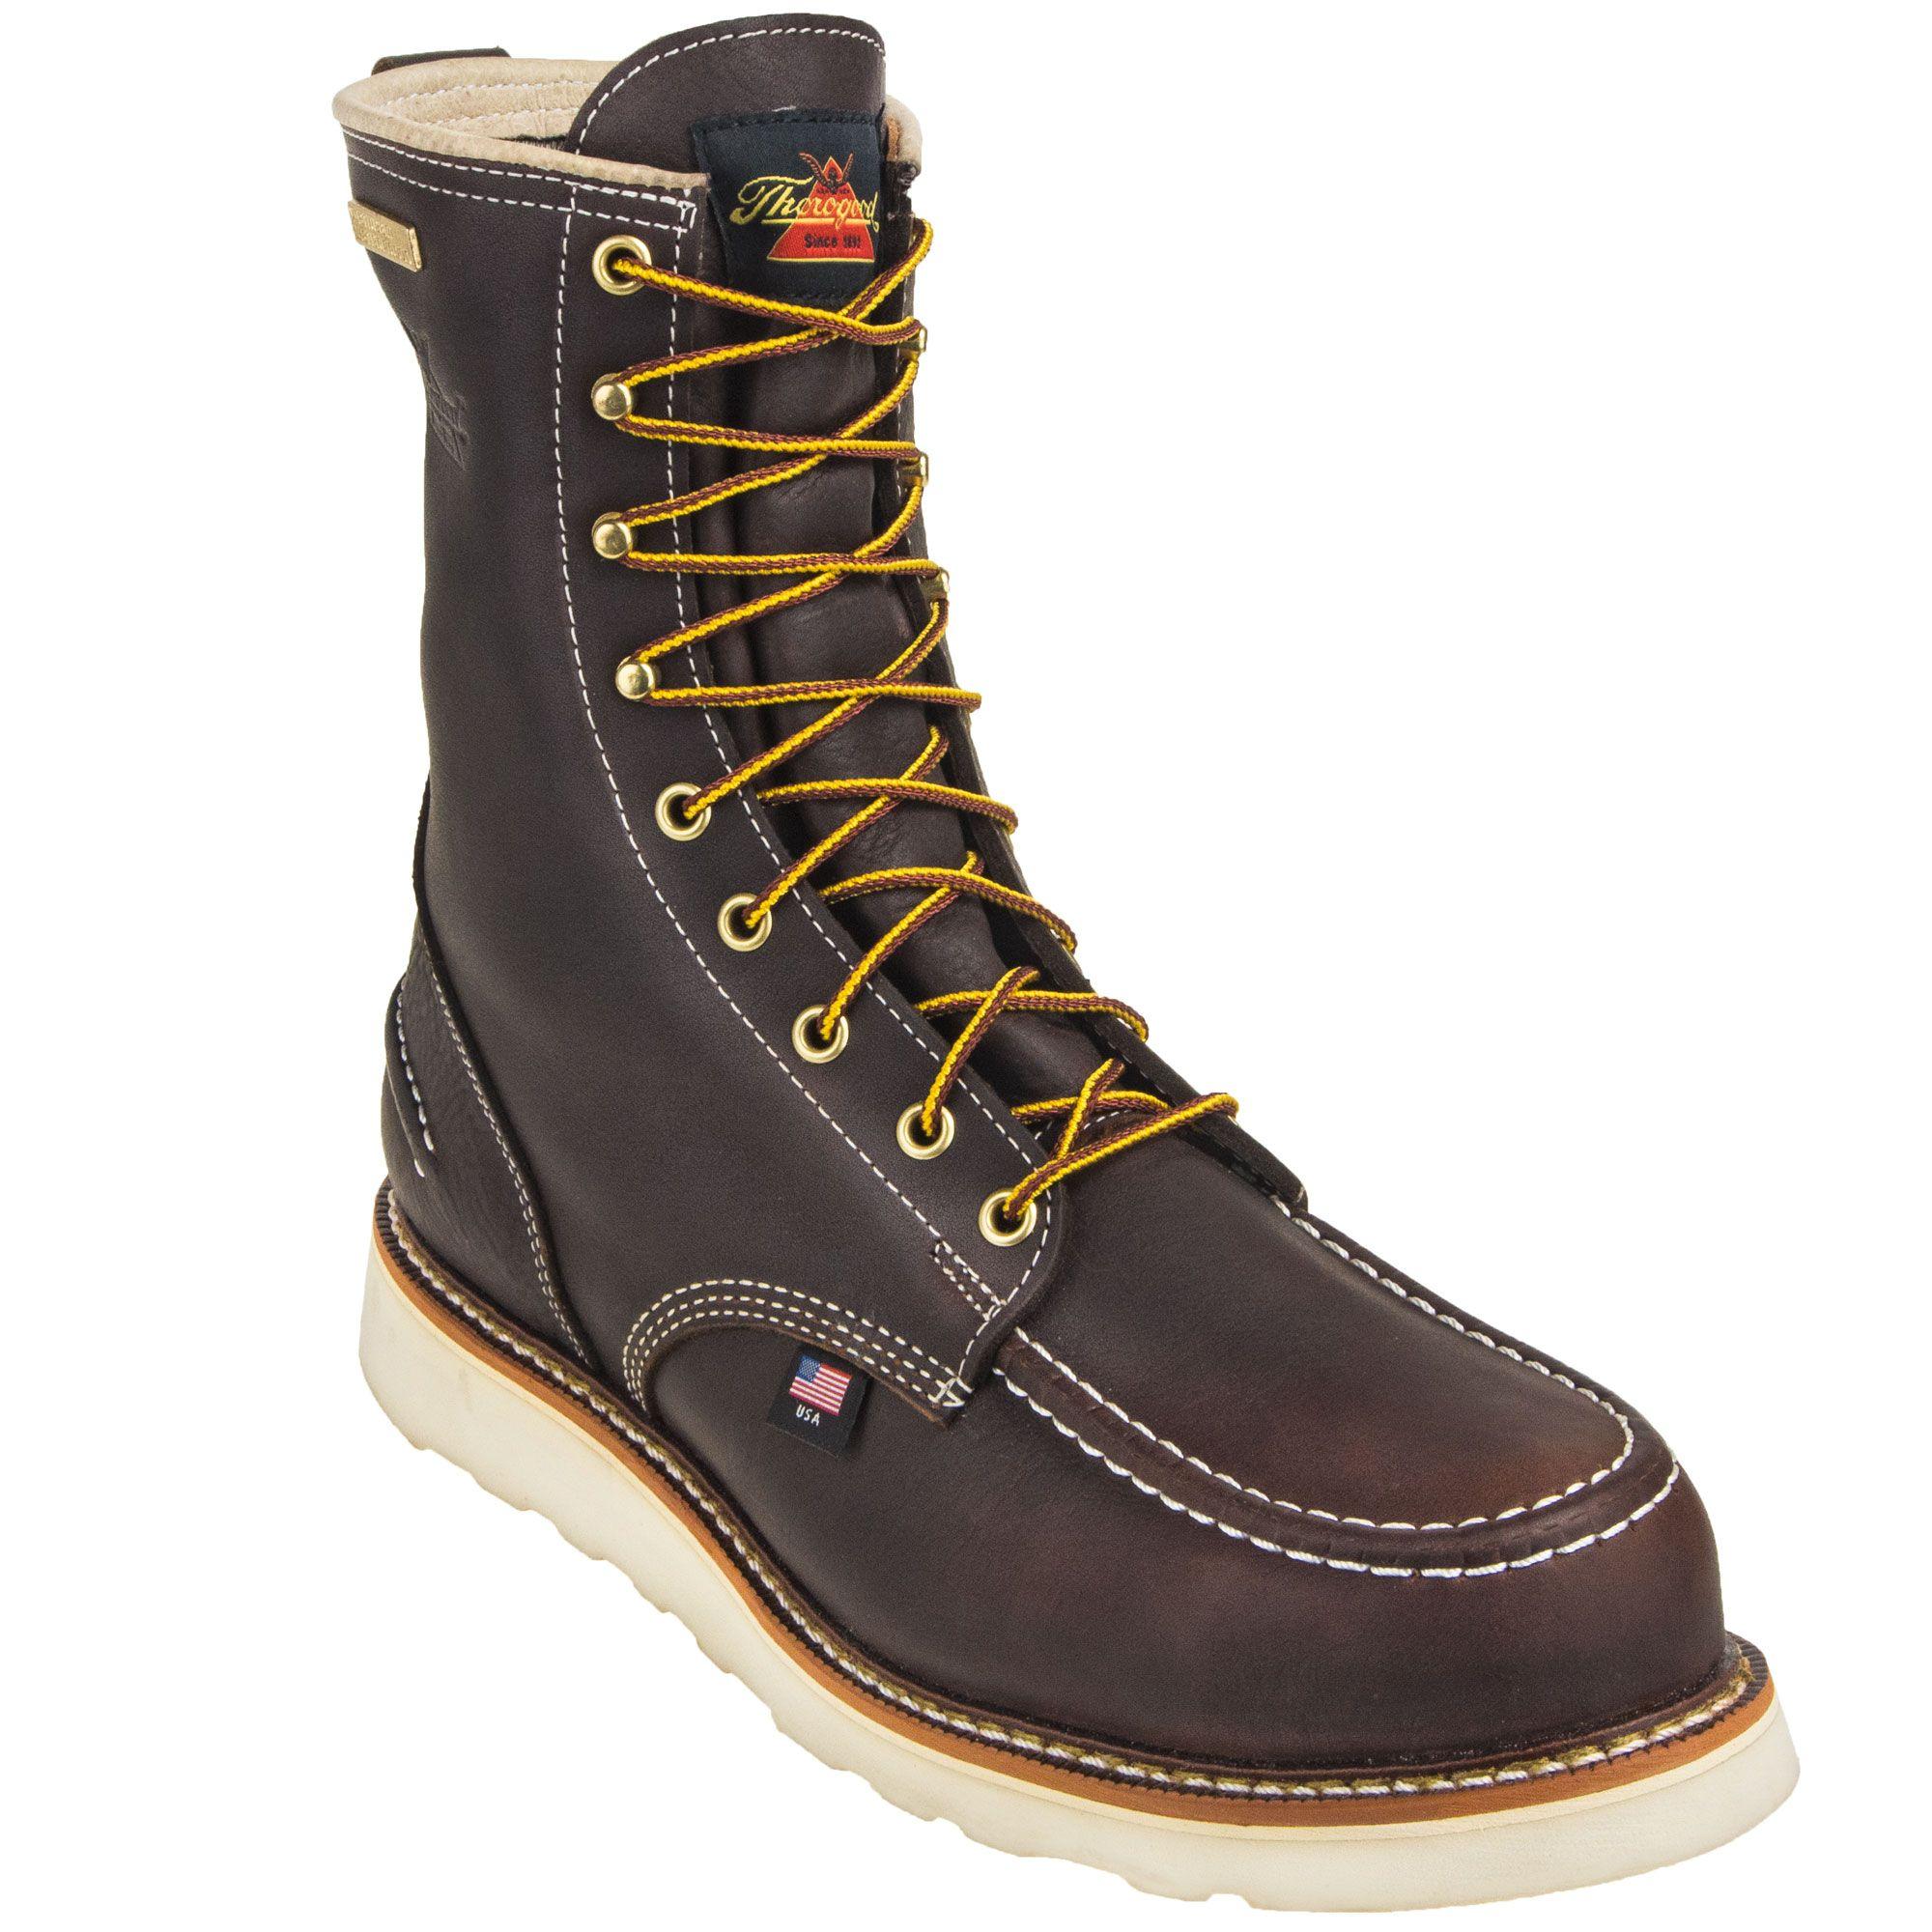 Thorogood Boots Men's 814 3800 American Heritage Non